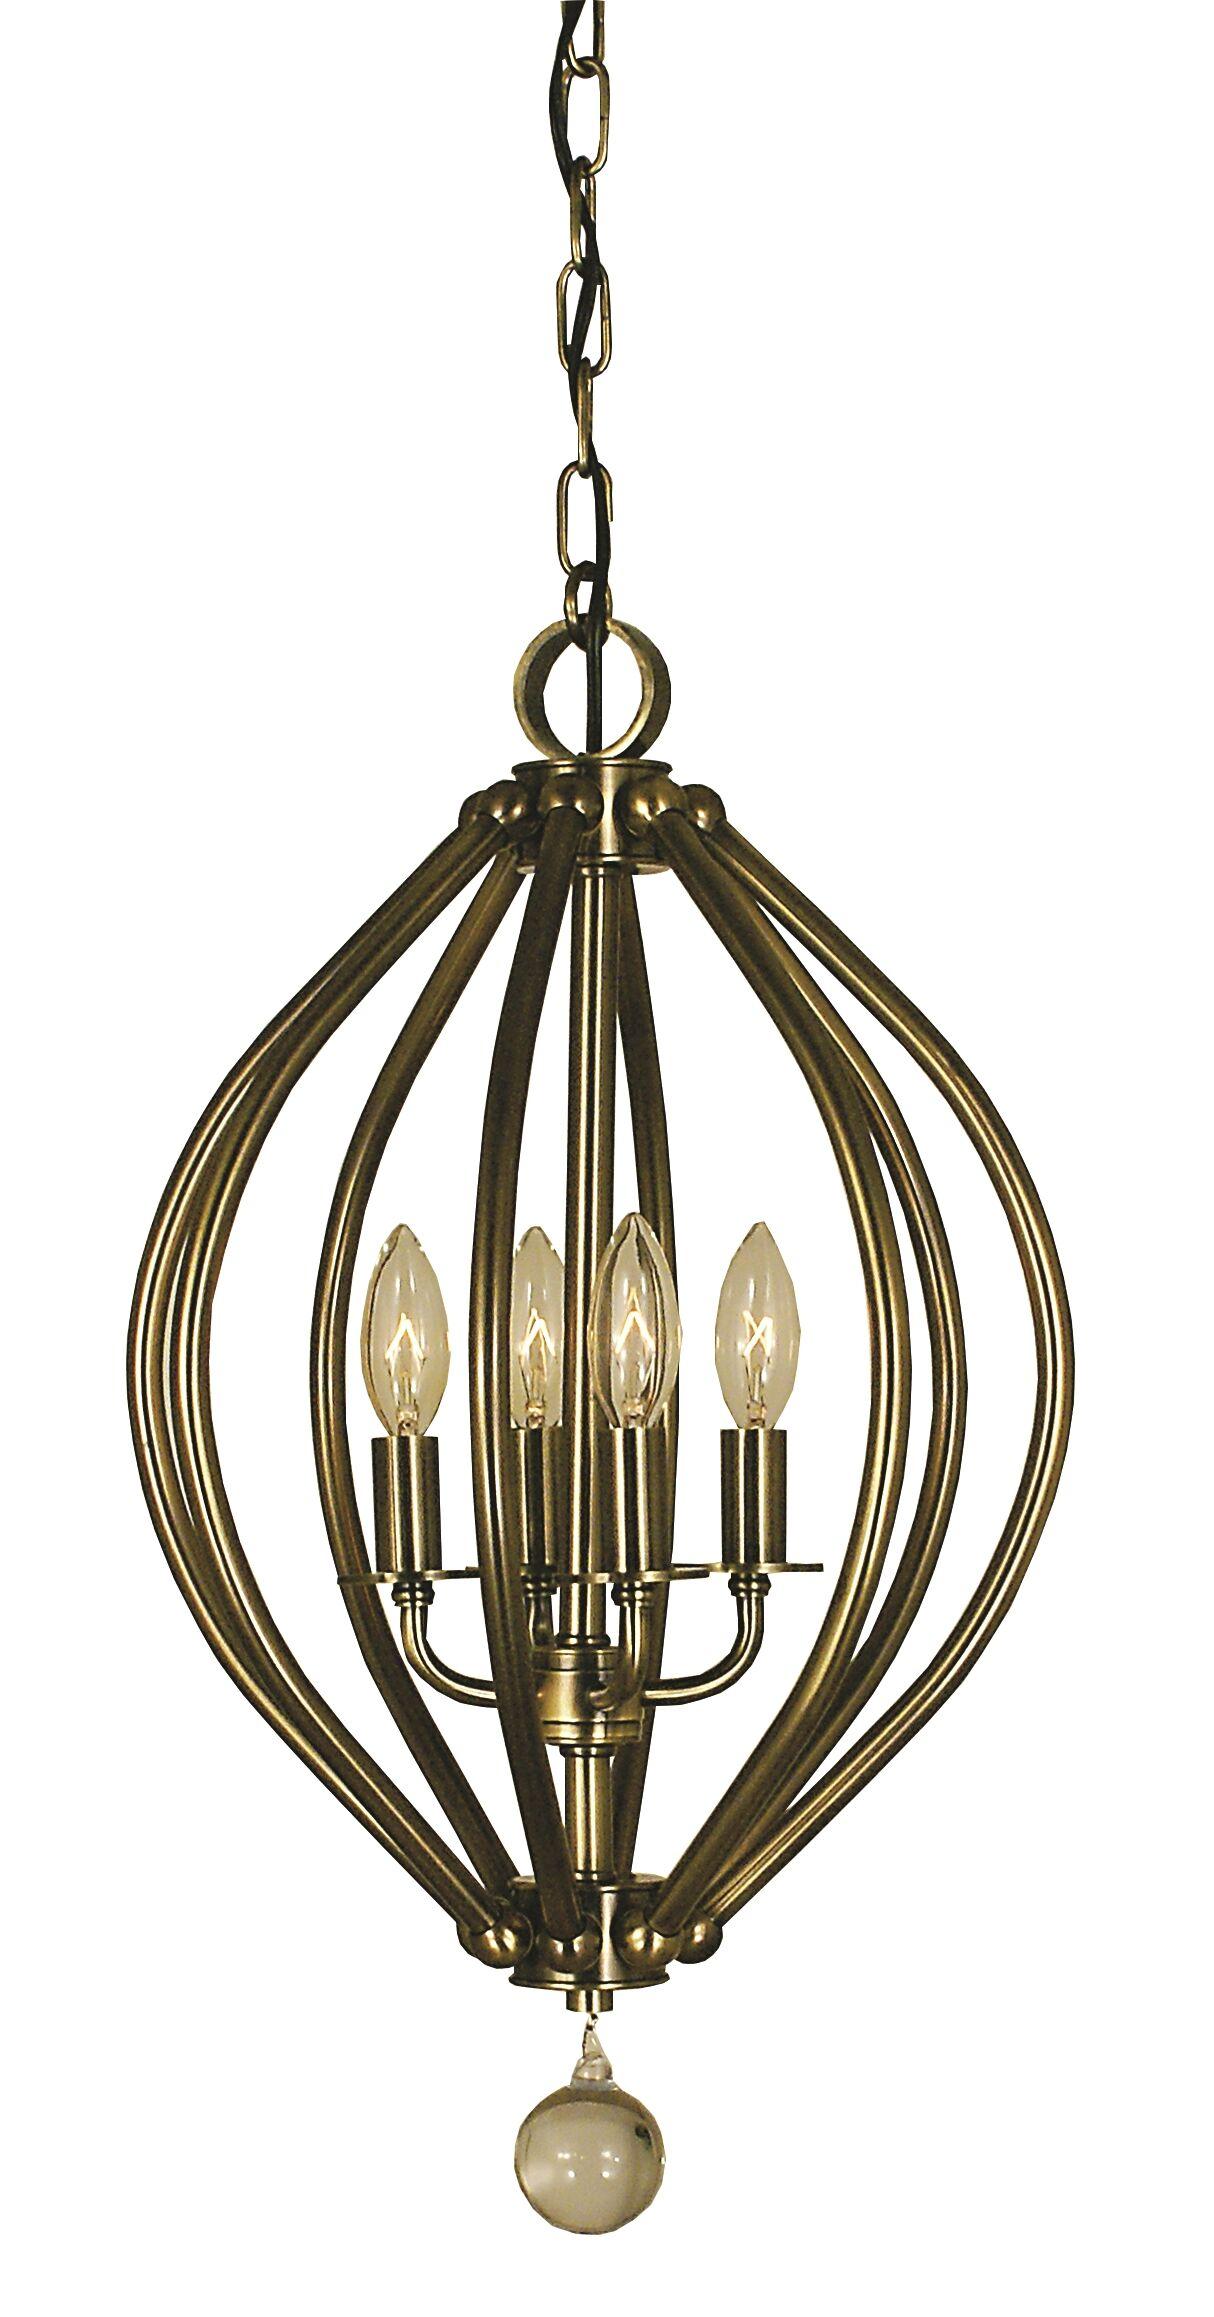 Dewdrop 4-Light Foyer Pendant Color: Antique Brass